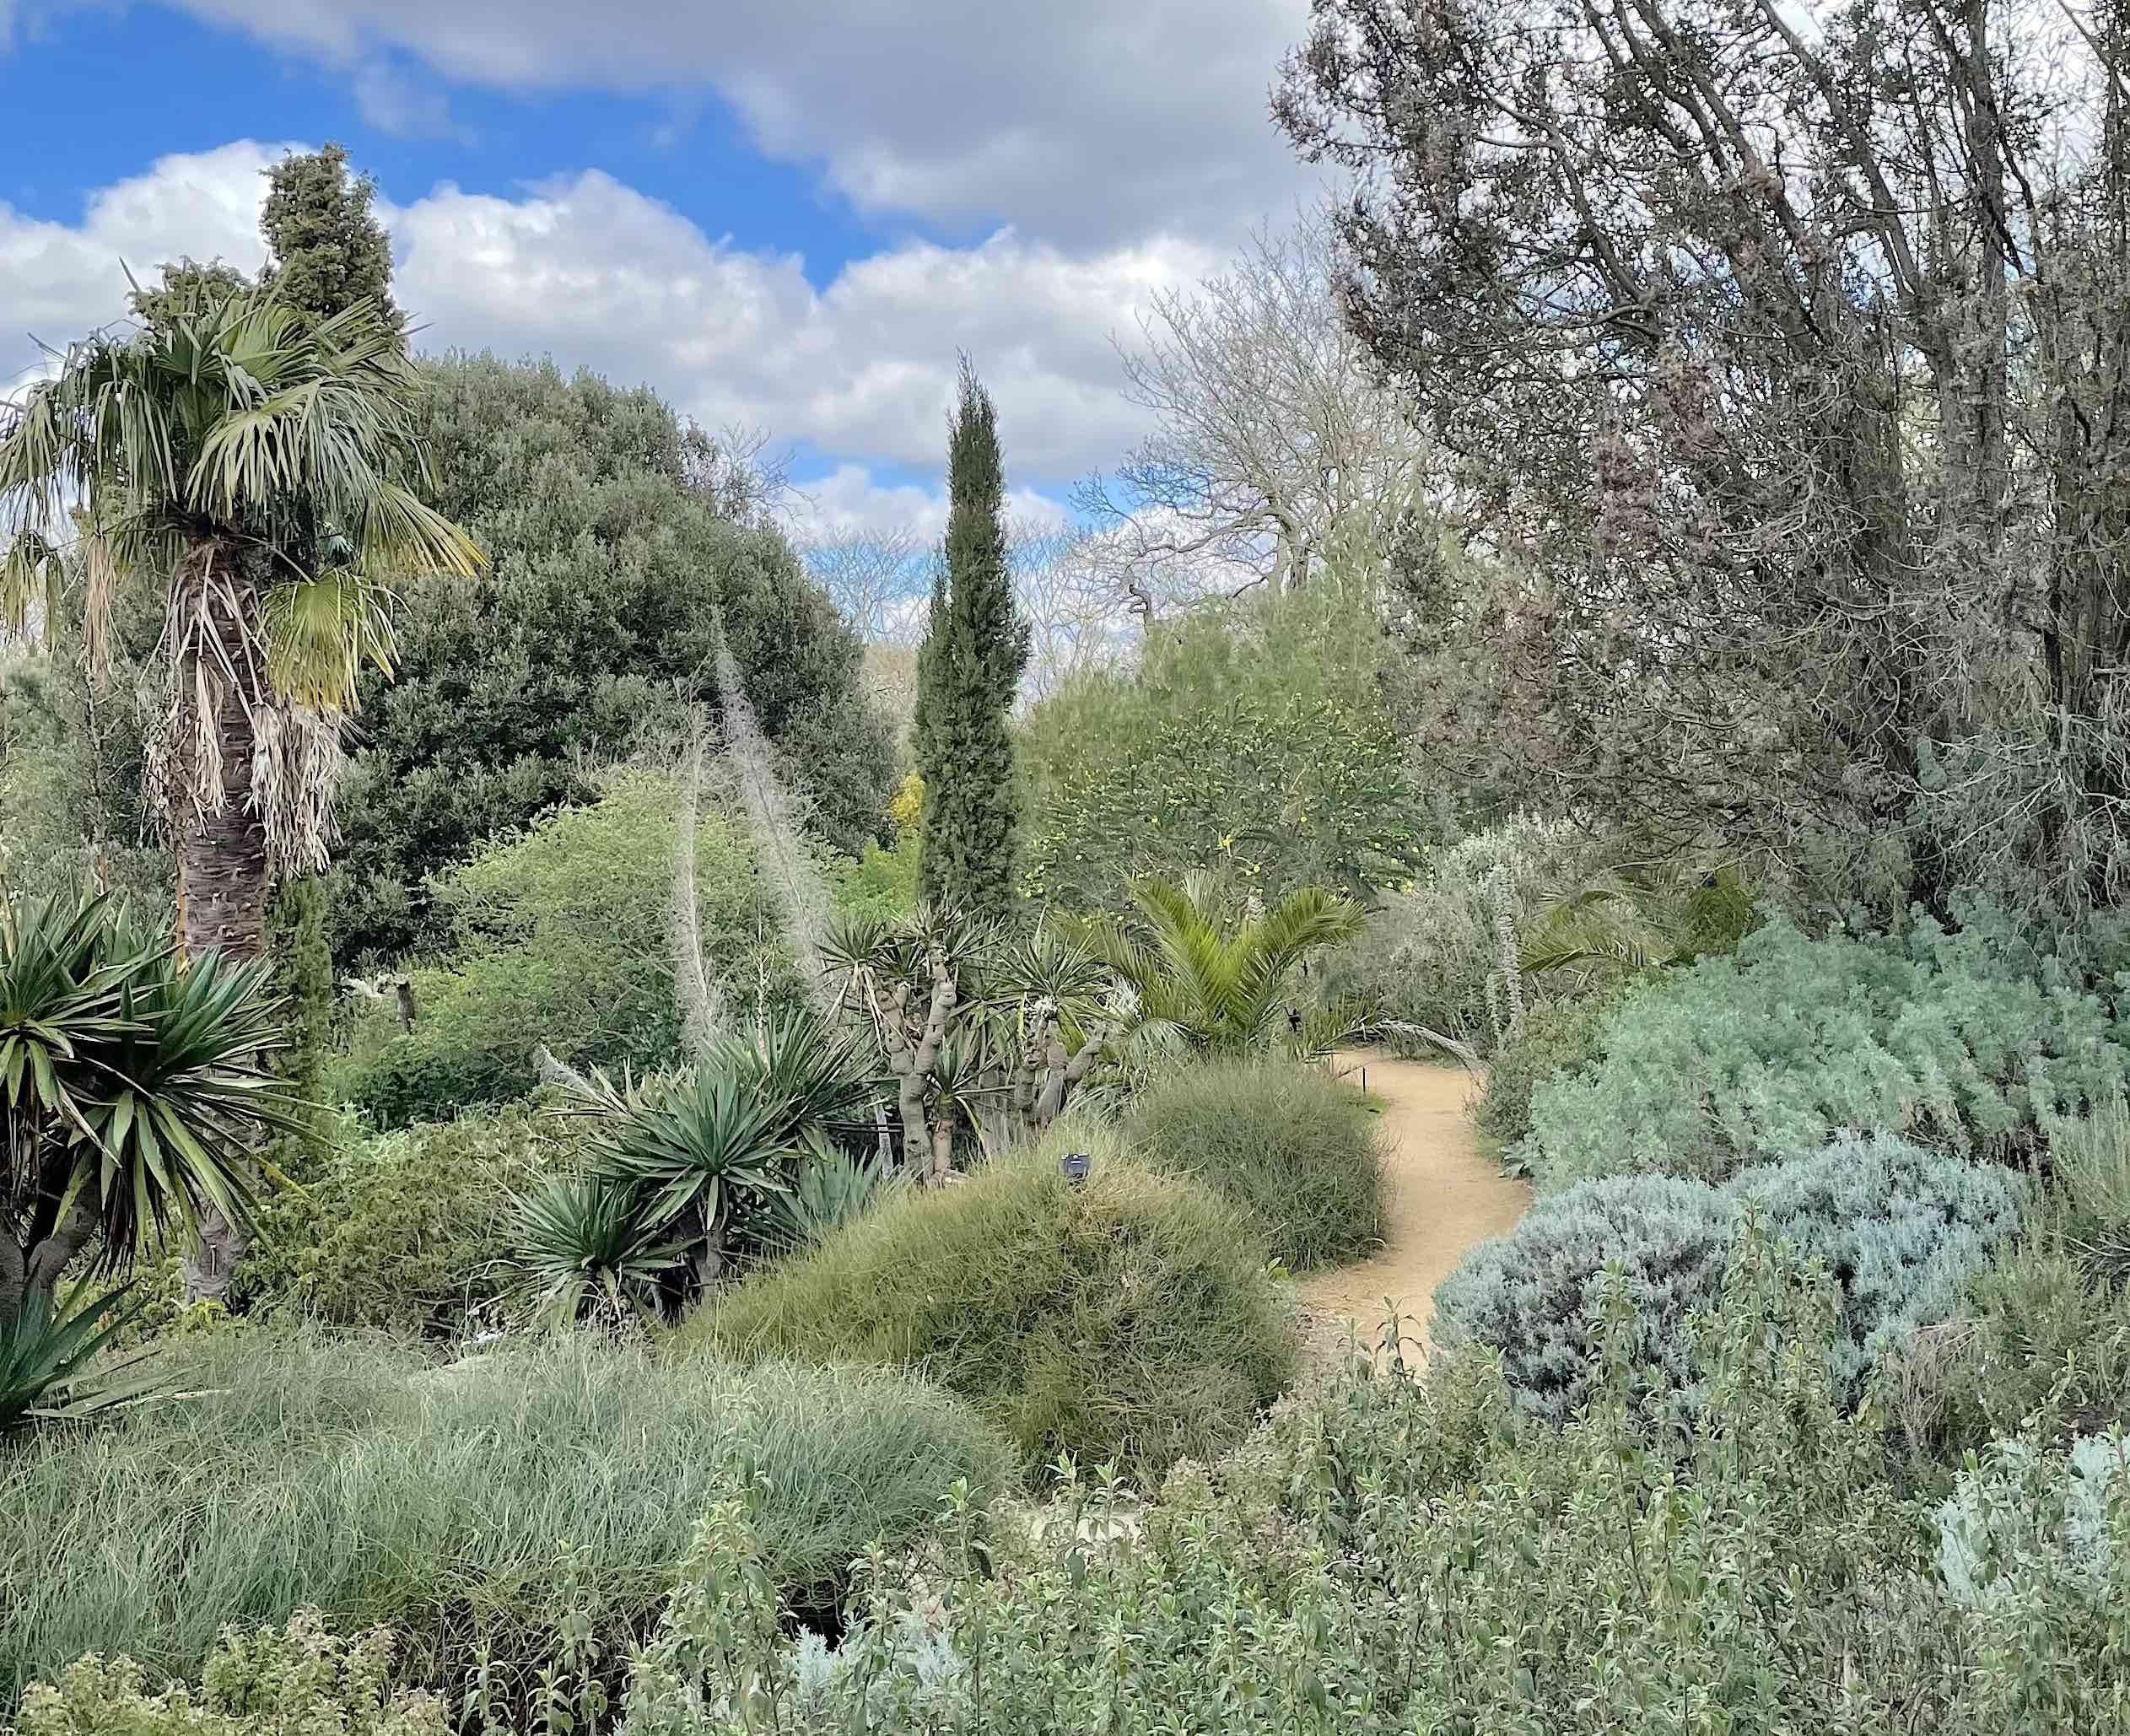 The Mediterranean garden, in Kew, is home to numerous New Zealand plants